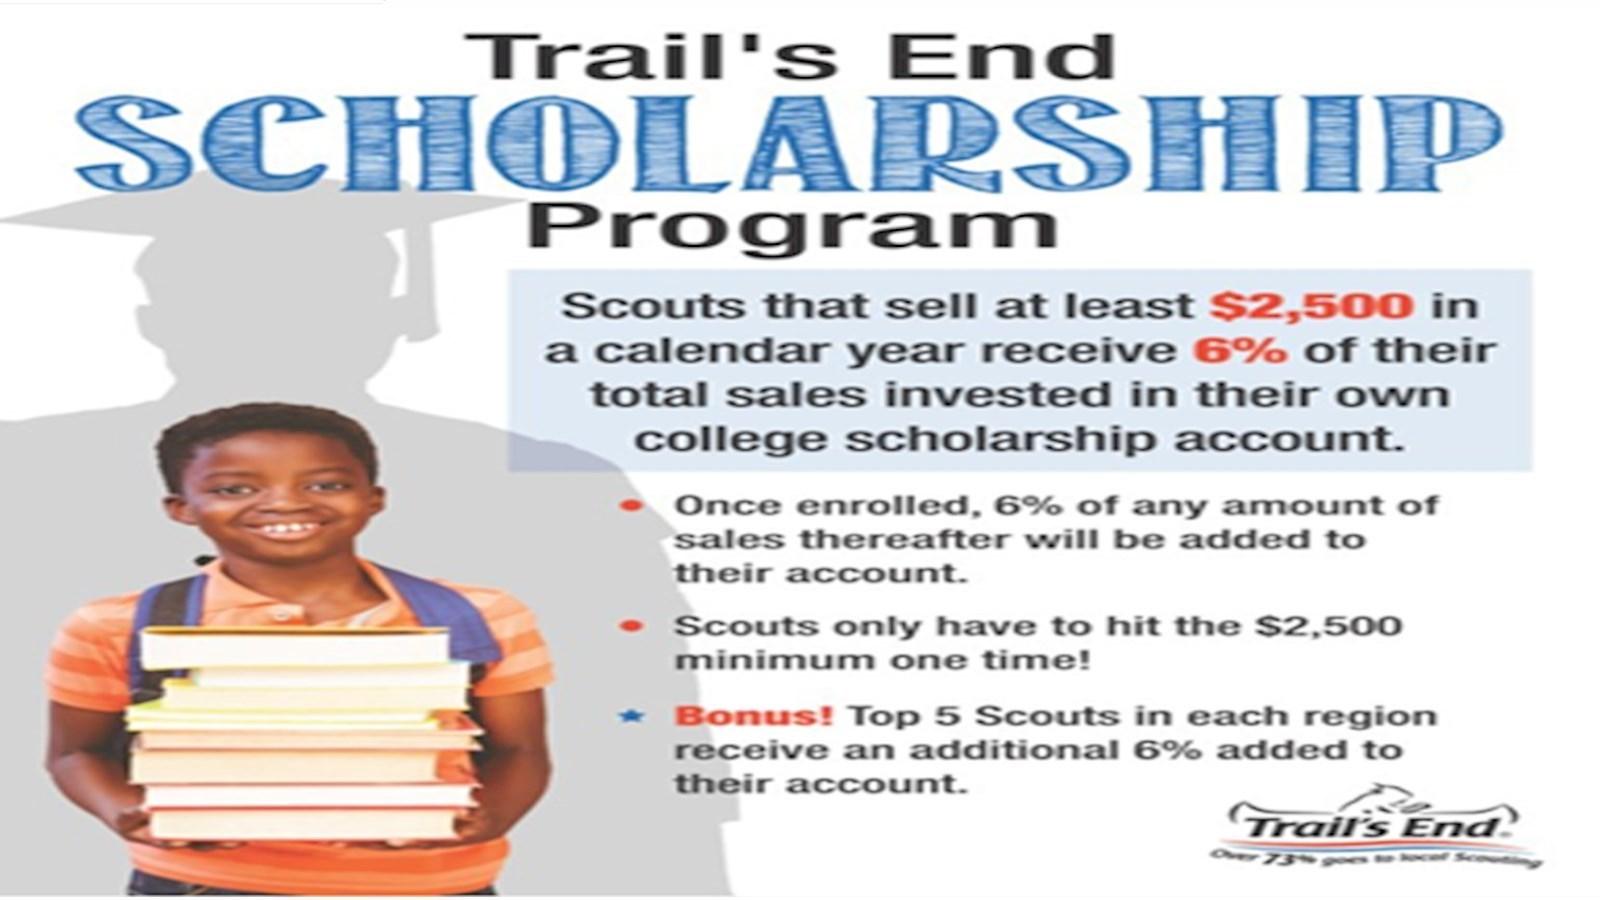 3.9 Scholarship Program